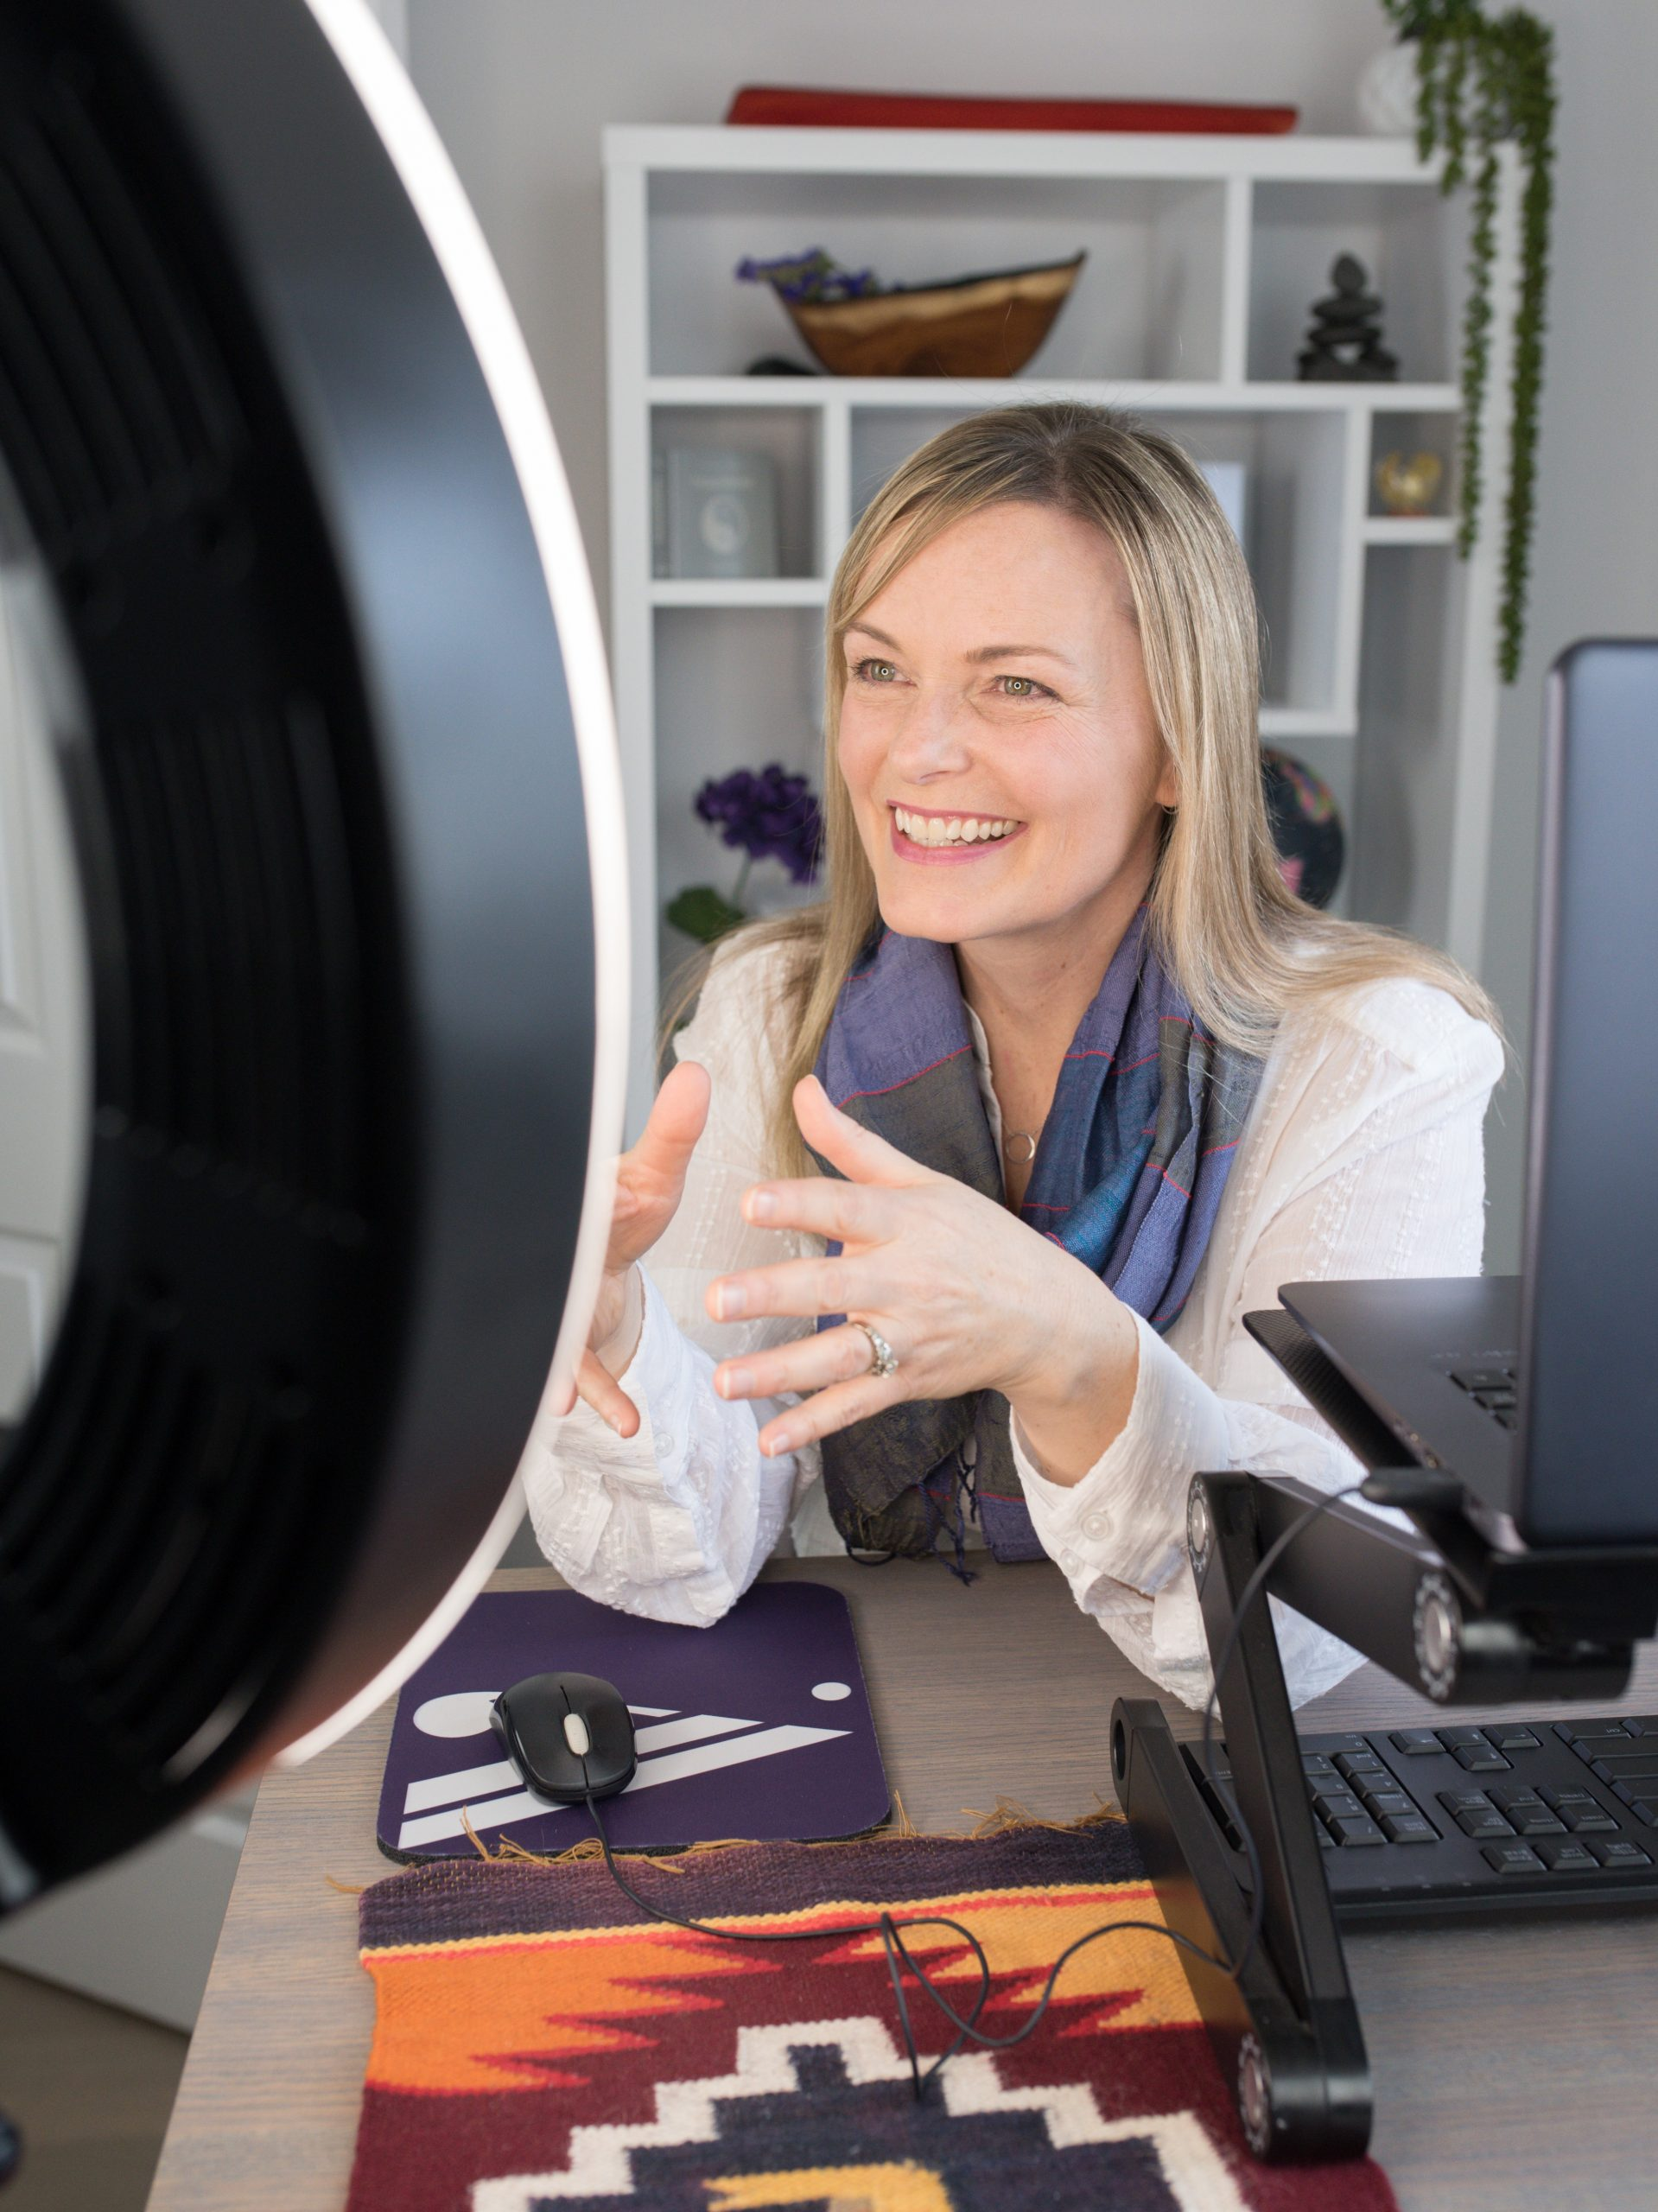 valerie mctavish video marketing expert